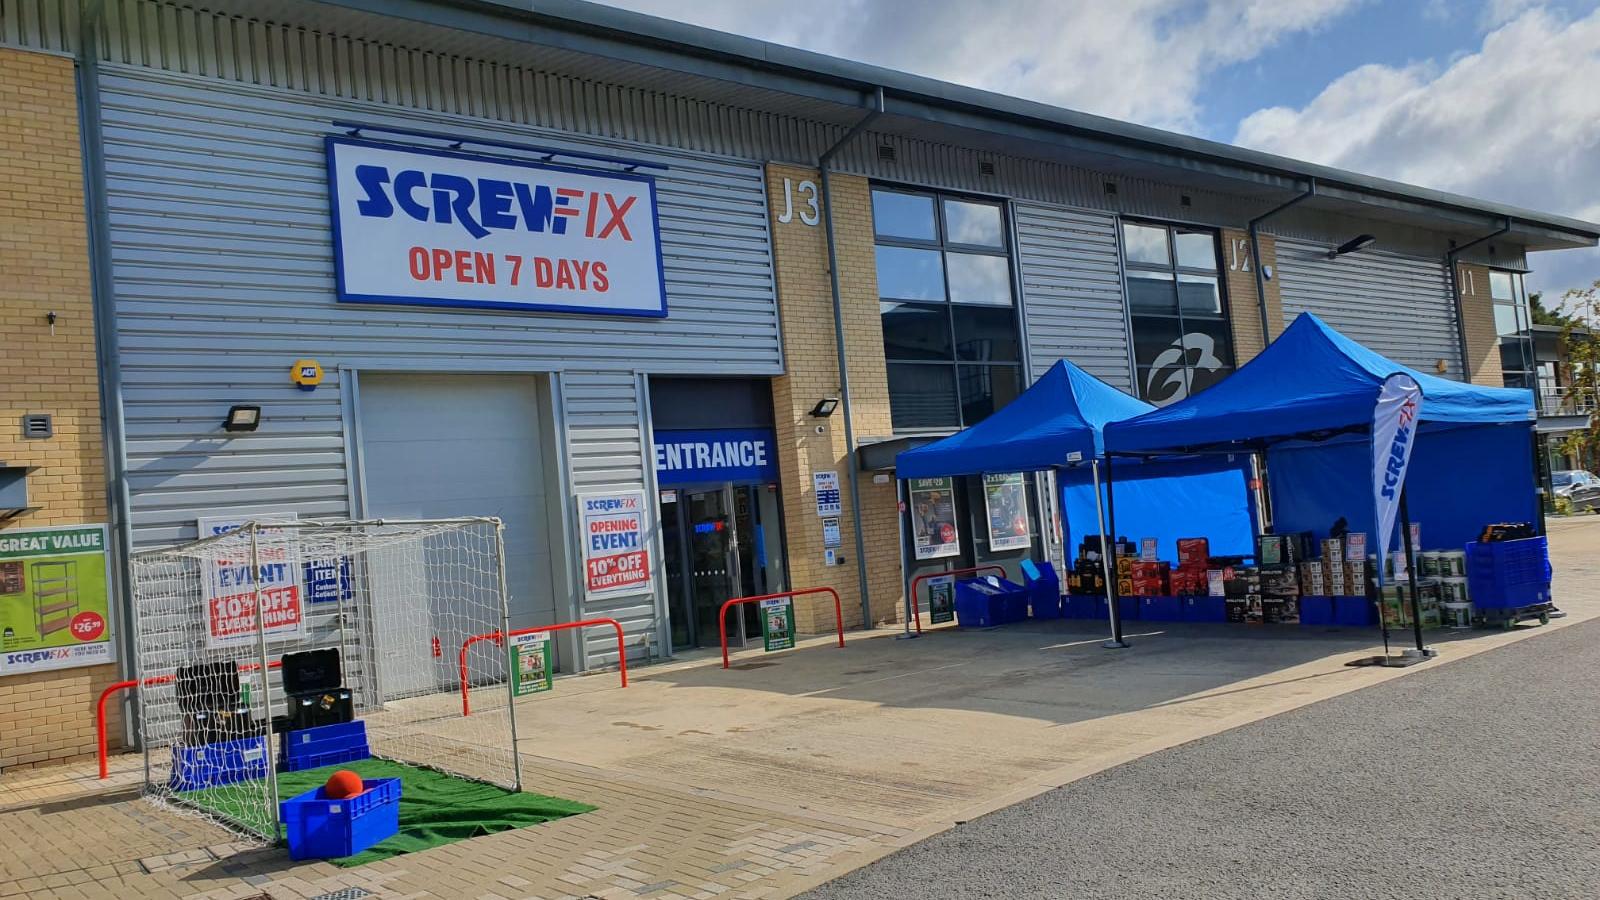 Ascot celebrates new Screwfix store opening